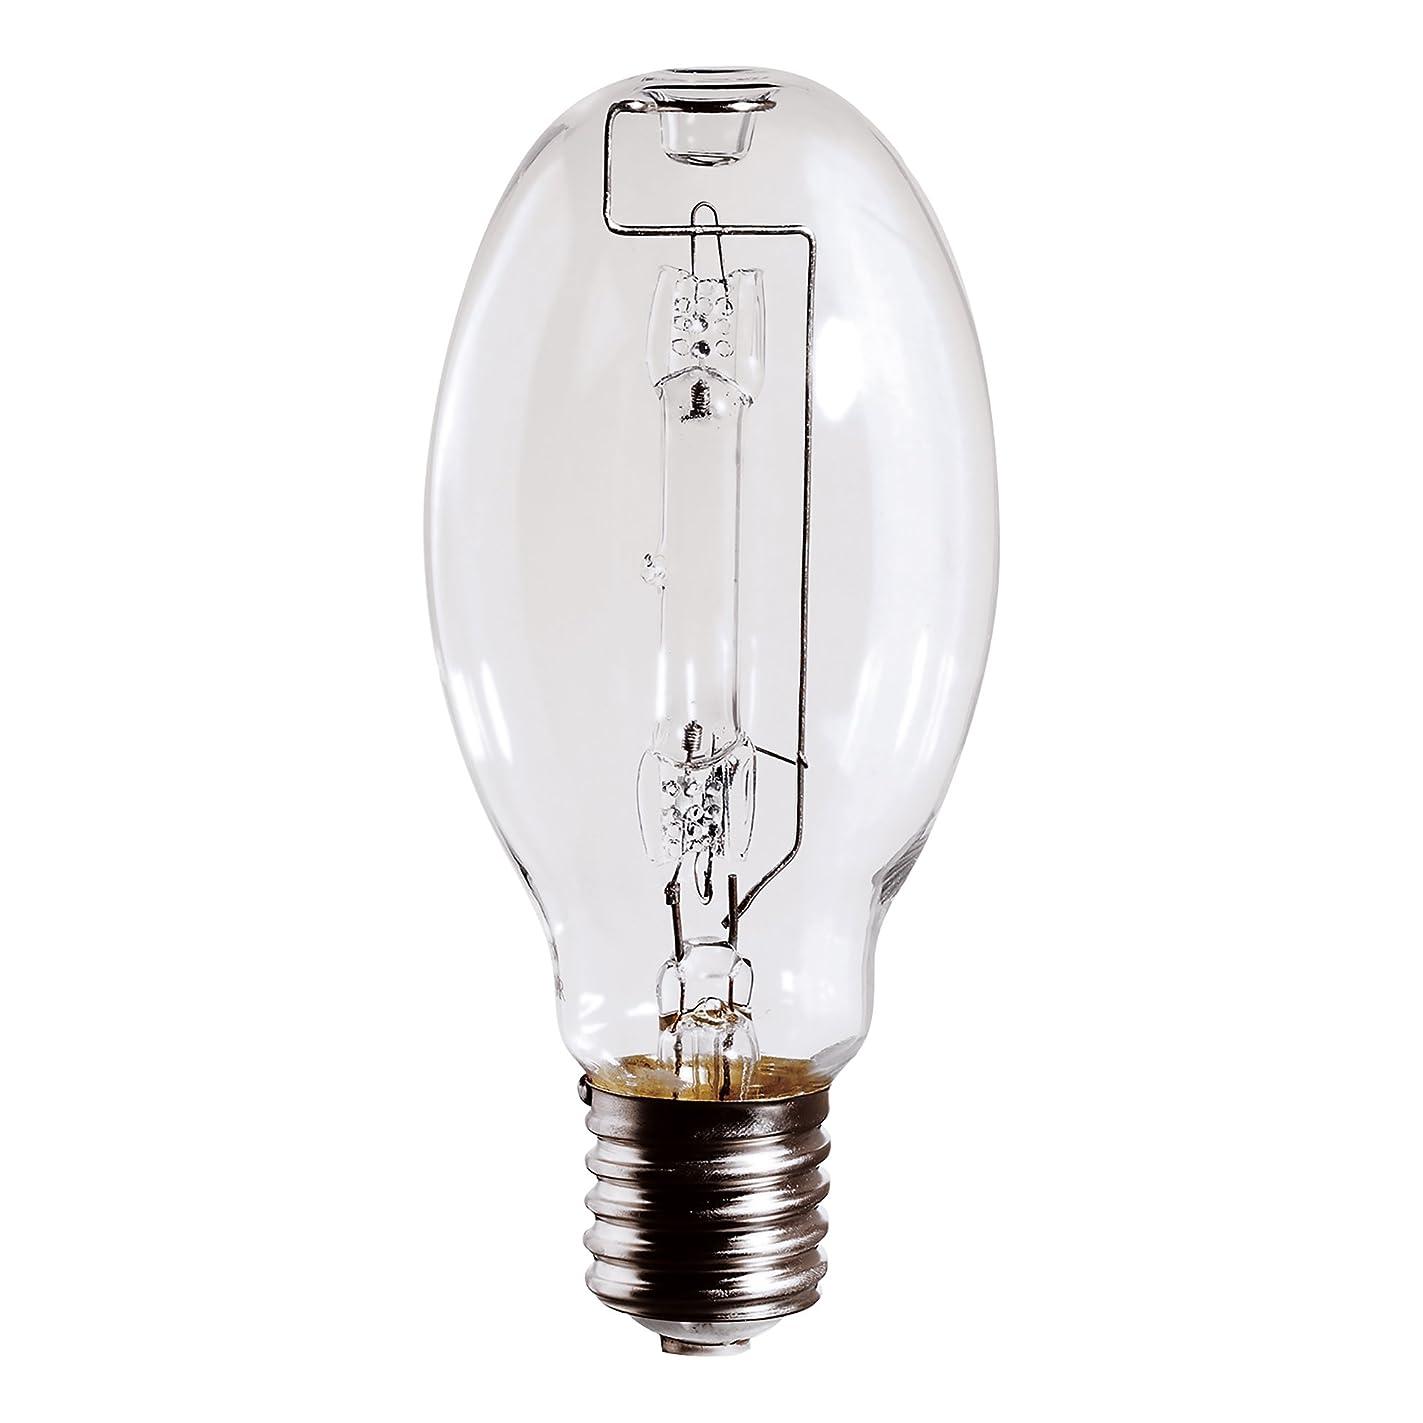 Brinks 7275 Bulb 175W Mercury Vapor Light